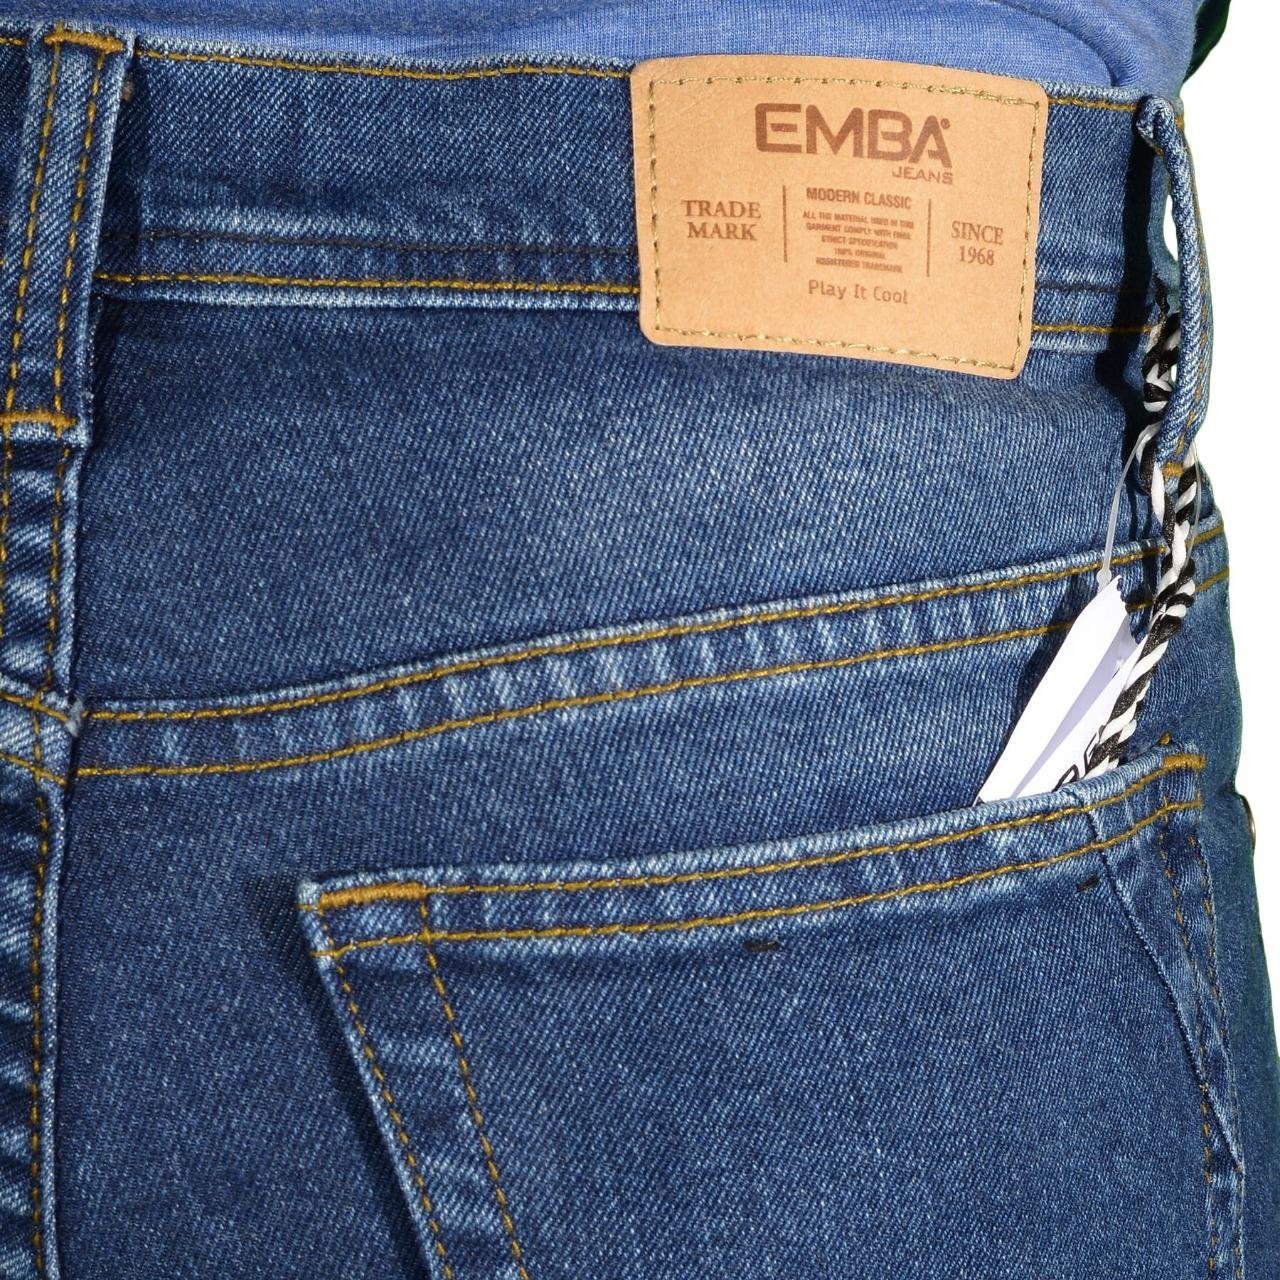 Emba Jeans Celana Panjang Pria Bs 08 Jordan Regular Charcoal Denosiq Denim Warna Heavy Stom 1 Abu 38 071 Morgan Slim 617 11204